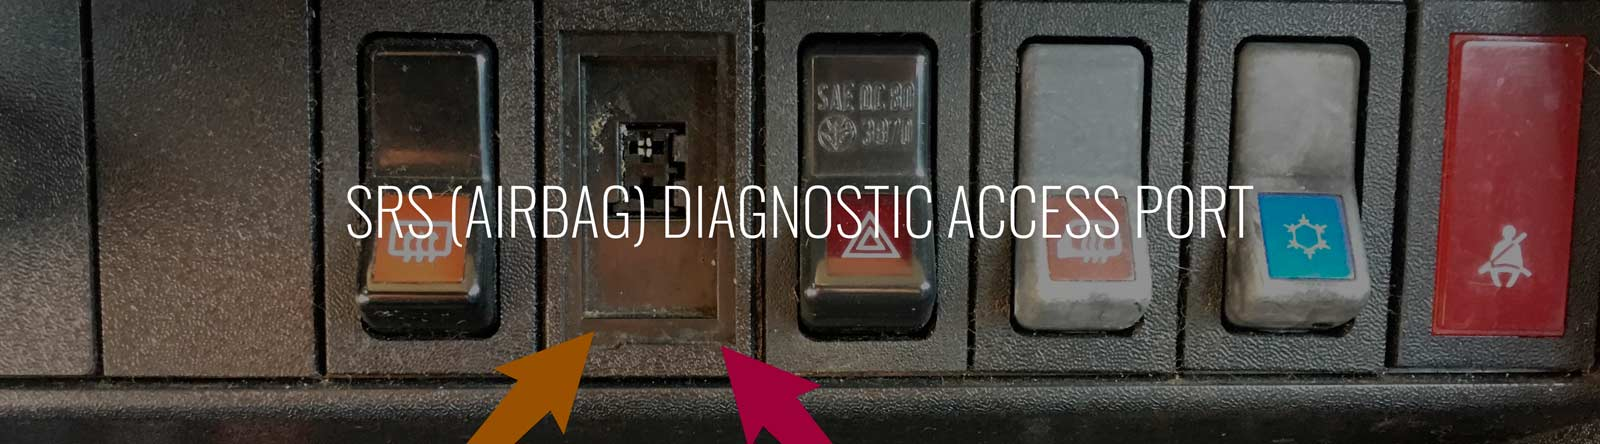 Srs (airbag) Diagnostic Access Port -